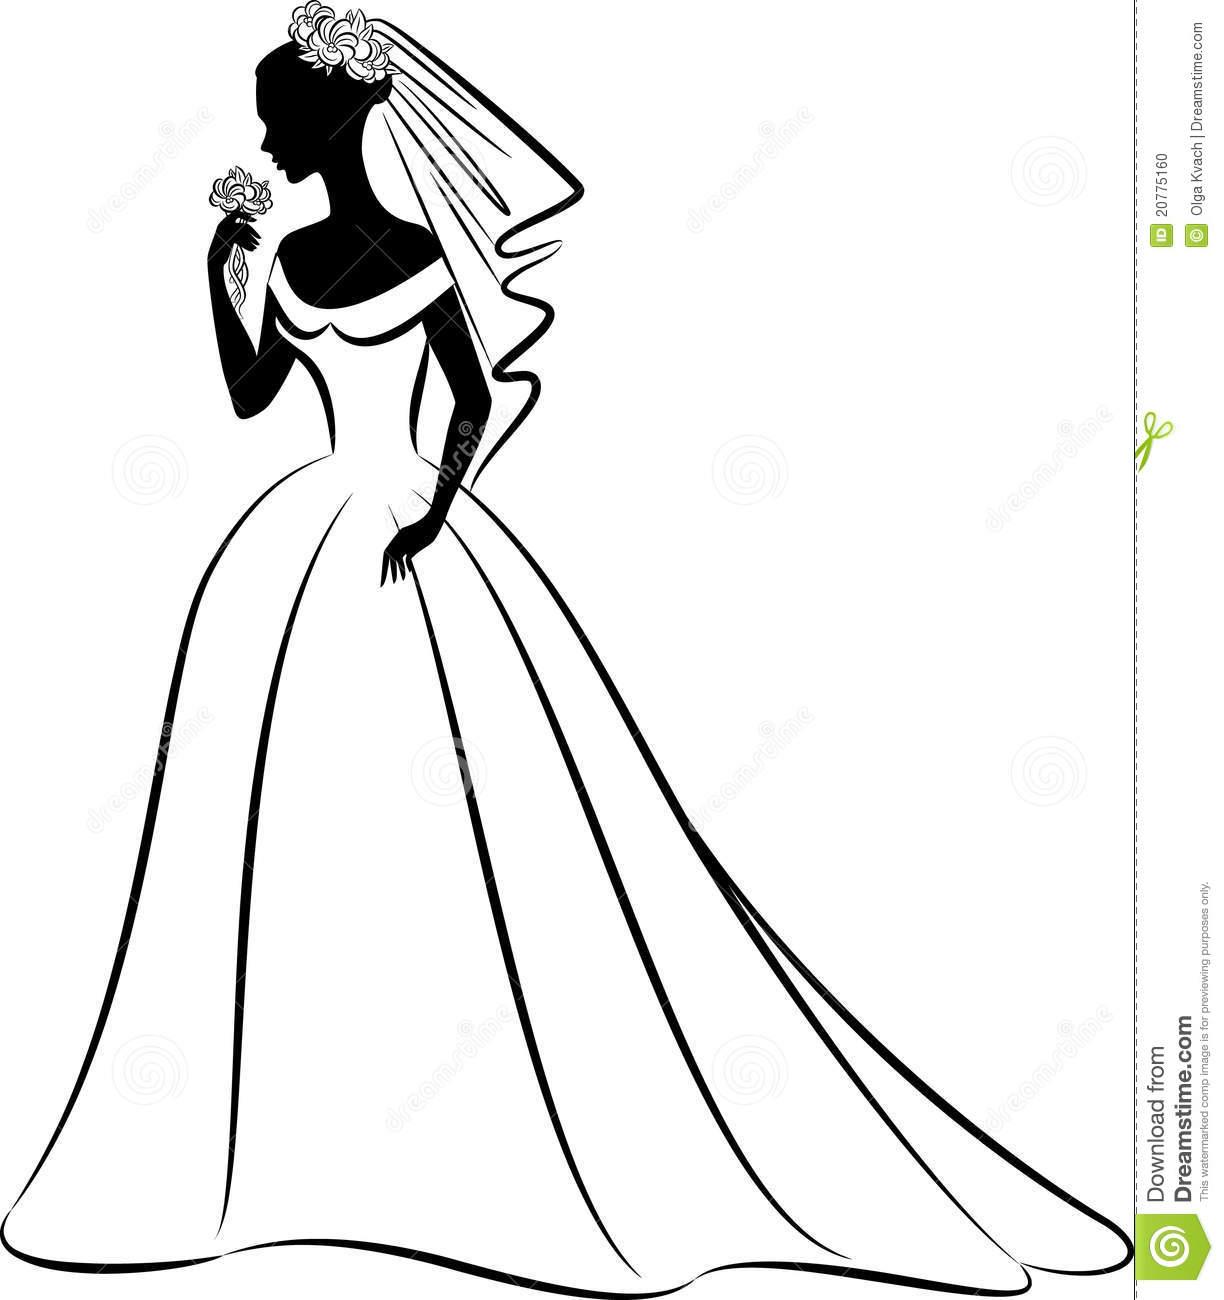 Vintage Wedding Dress Clipart Wedding Dr-Vintage Wedding Dress Clipart Wedding Dress Clipart Outline Silhouette-9